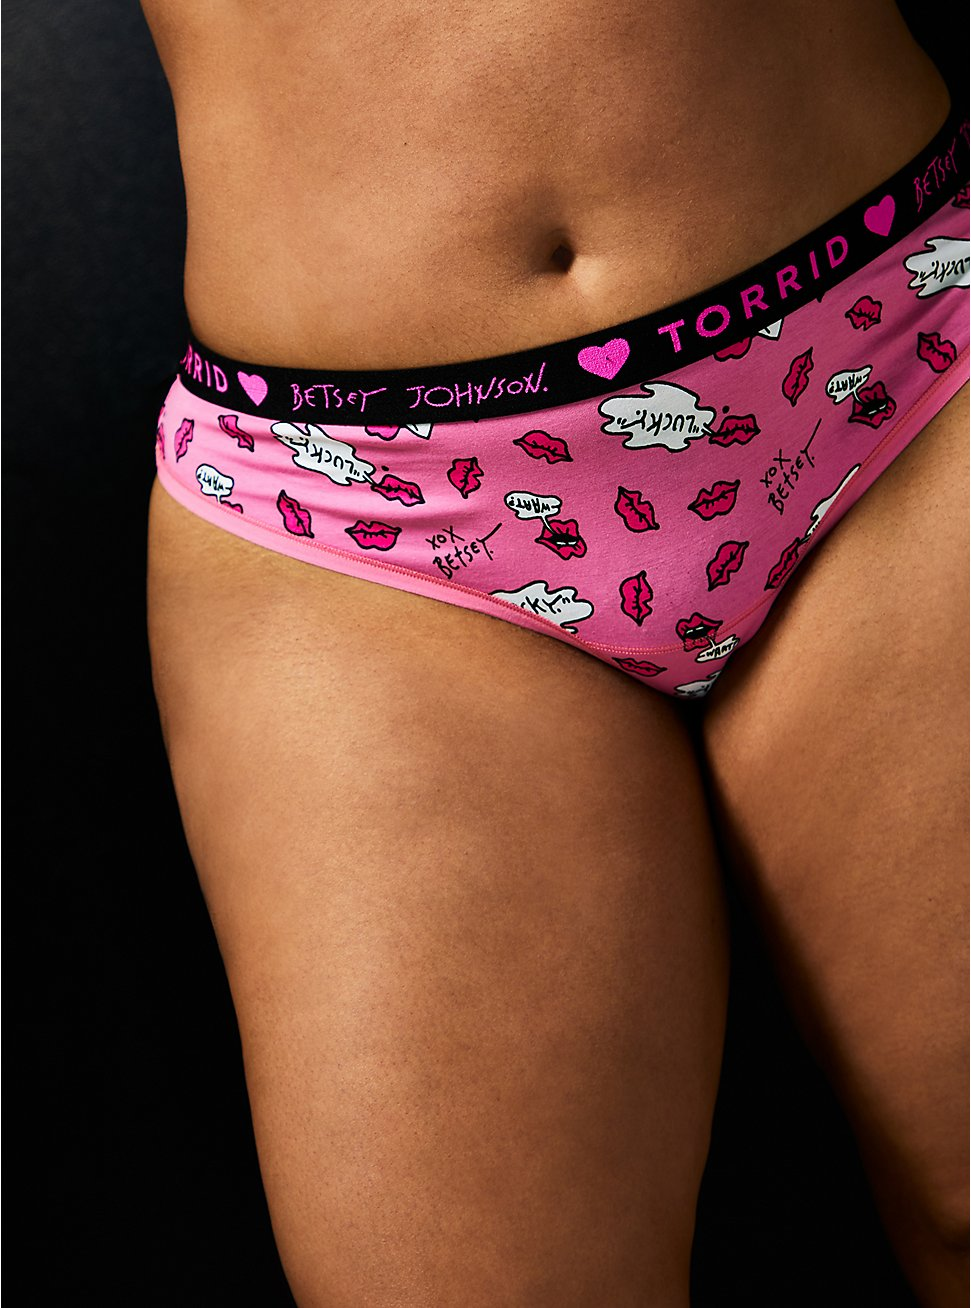 Betsey Johnson Logo Pink Lips Cotton Thong Panty , LIP SERVICE-PINK, hi-res